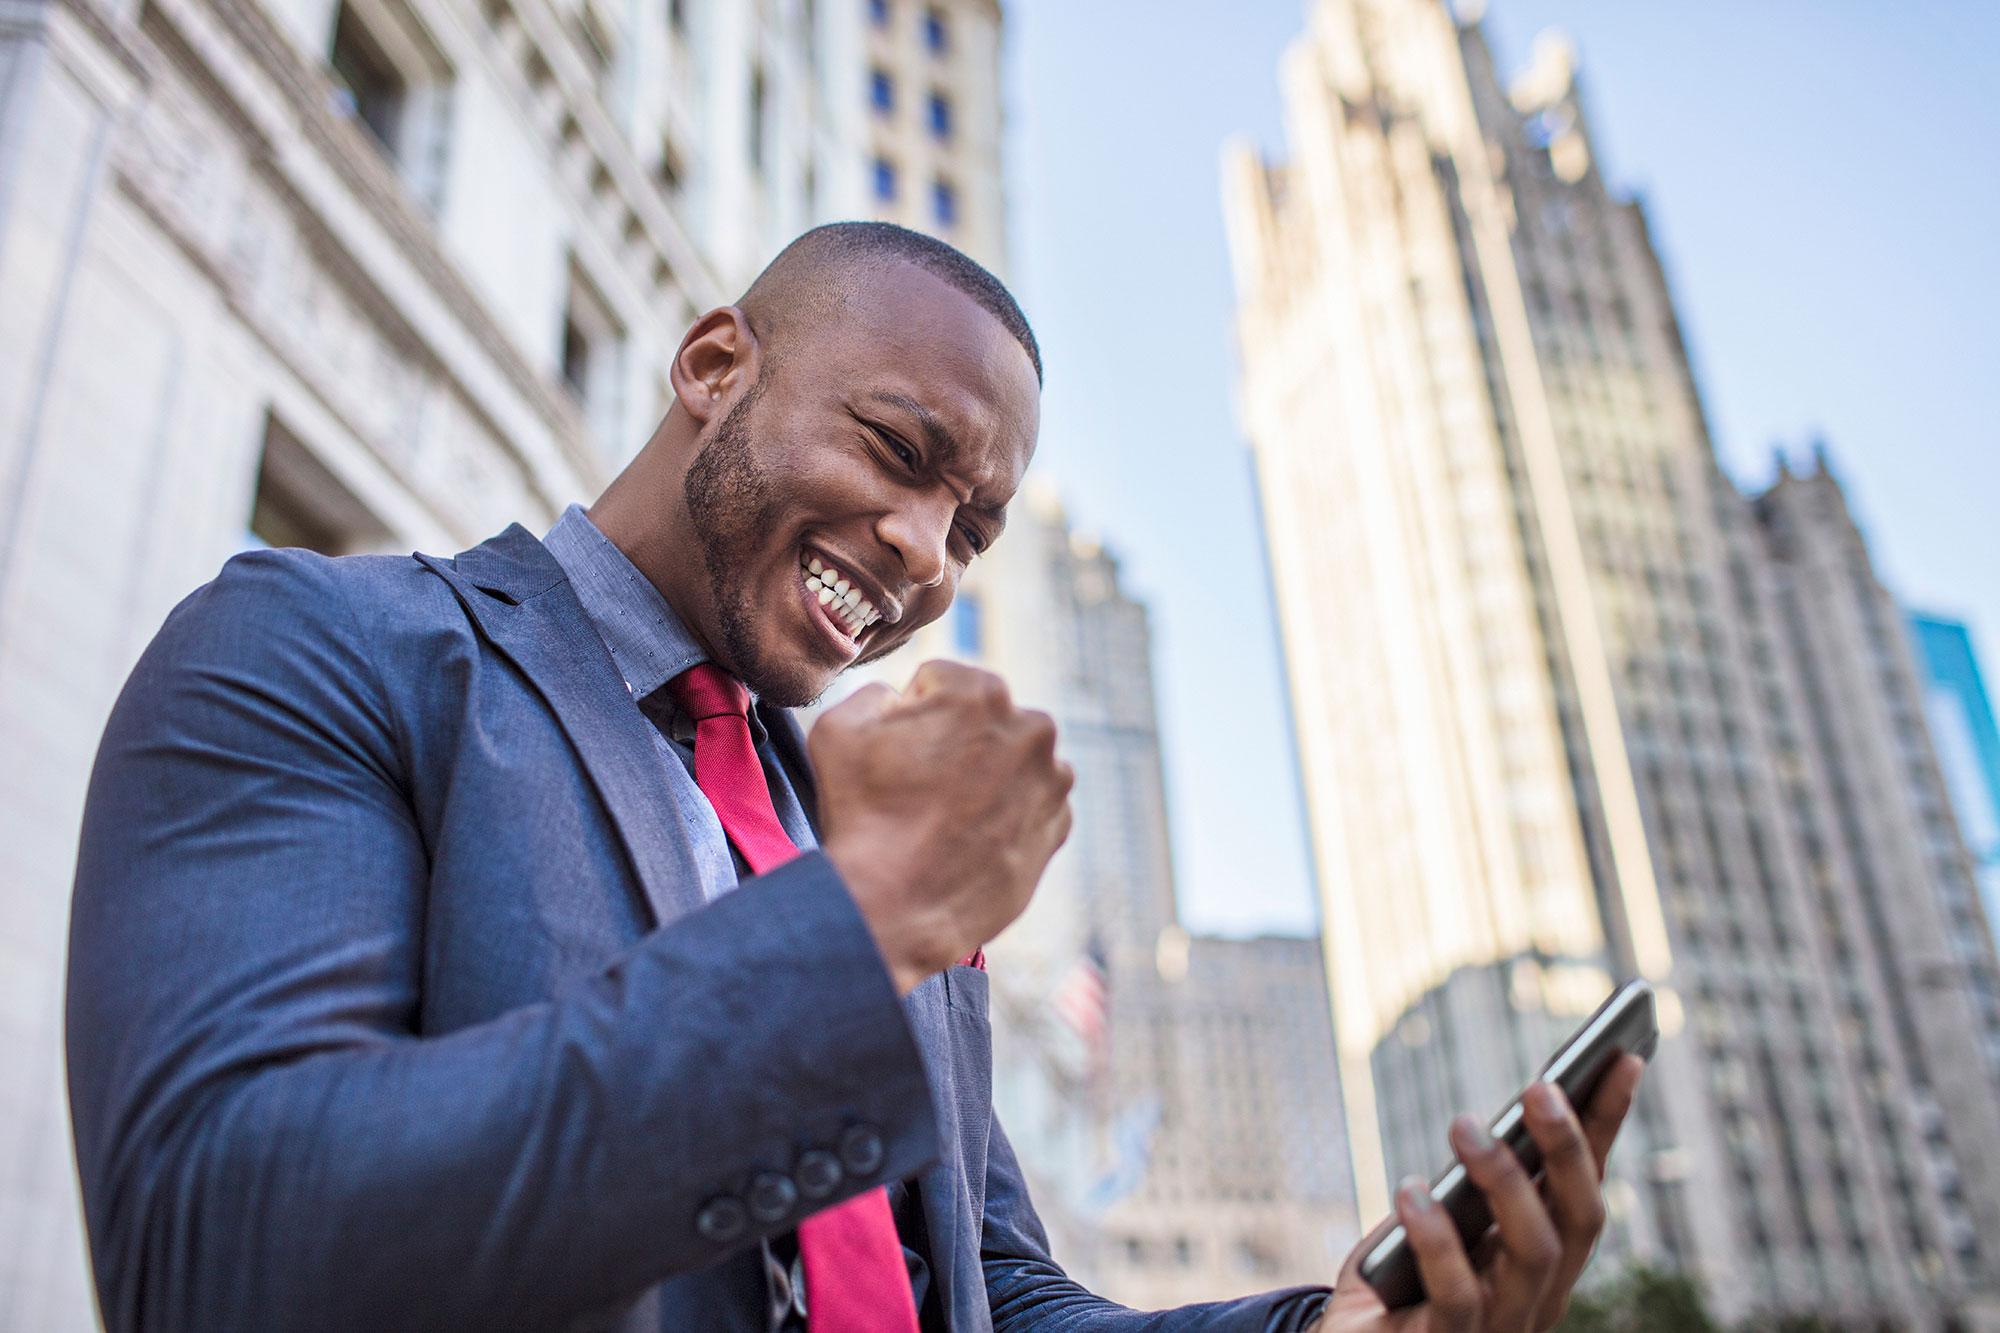 business-man-holding-mobile-phone-celebrating-smiling-fist-pump